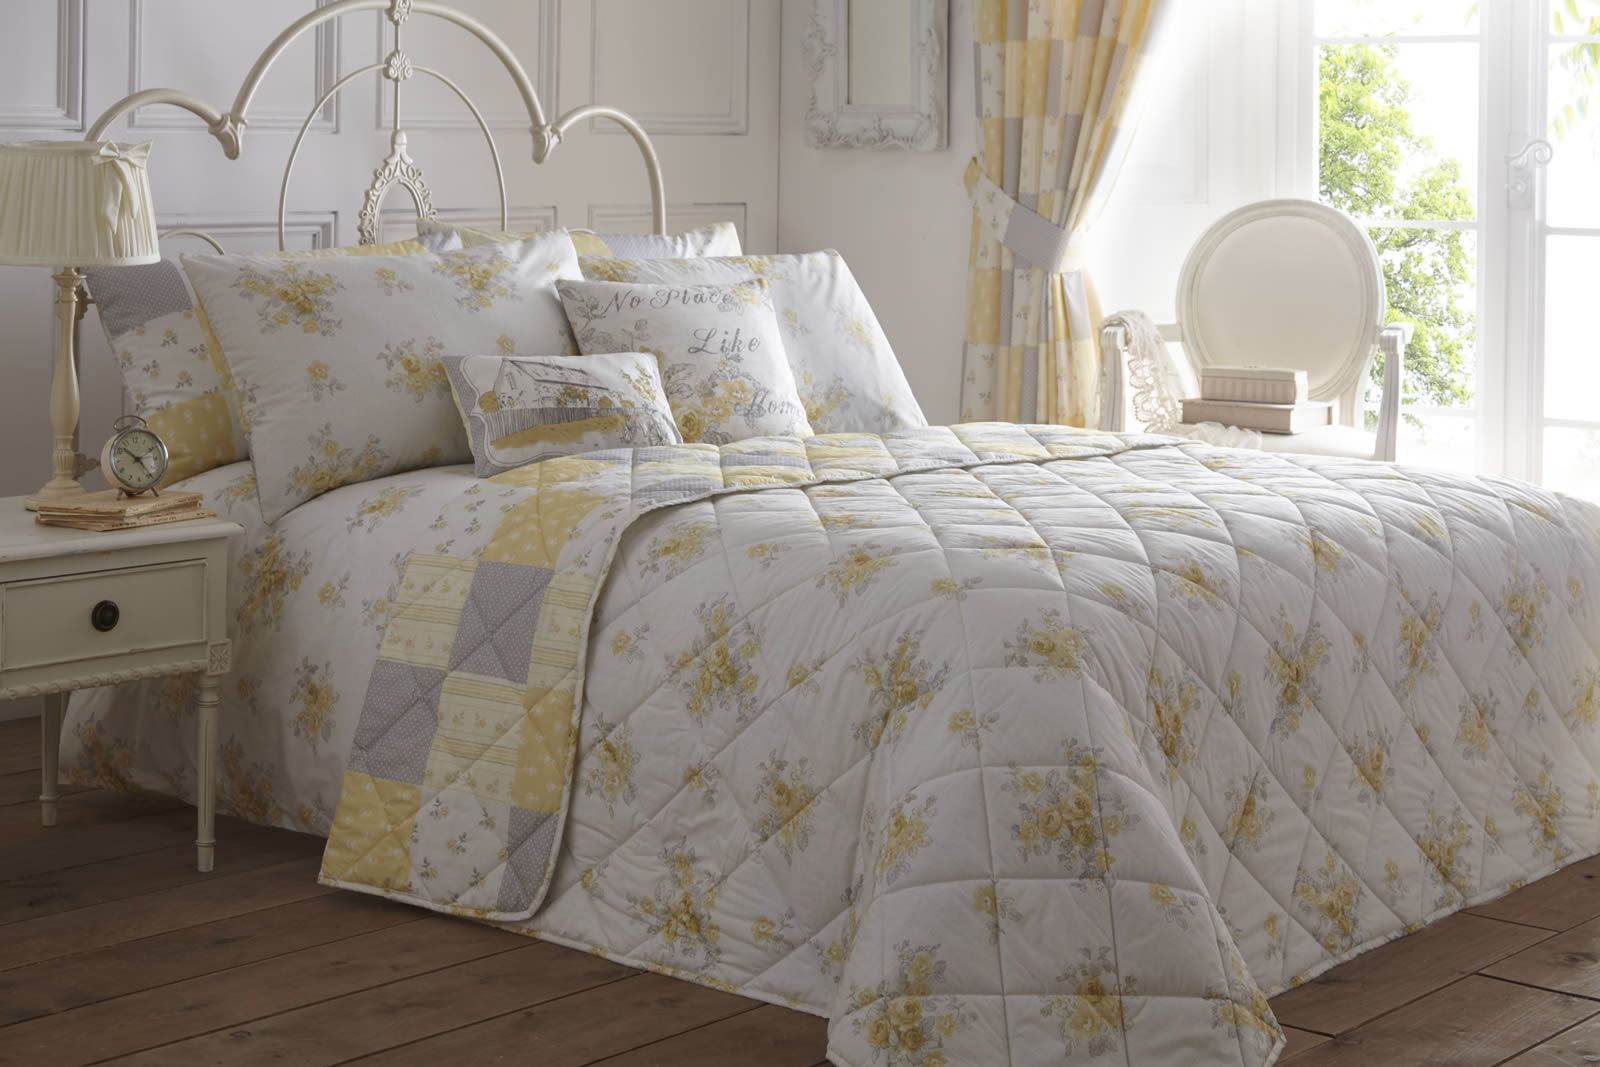 Lemon And Grey Bedroom Lemon Reversible Patchwork Floral Duvet Cover Easy Care Quilt